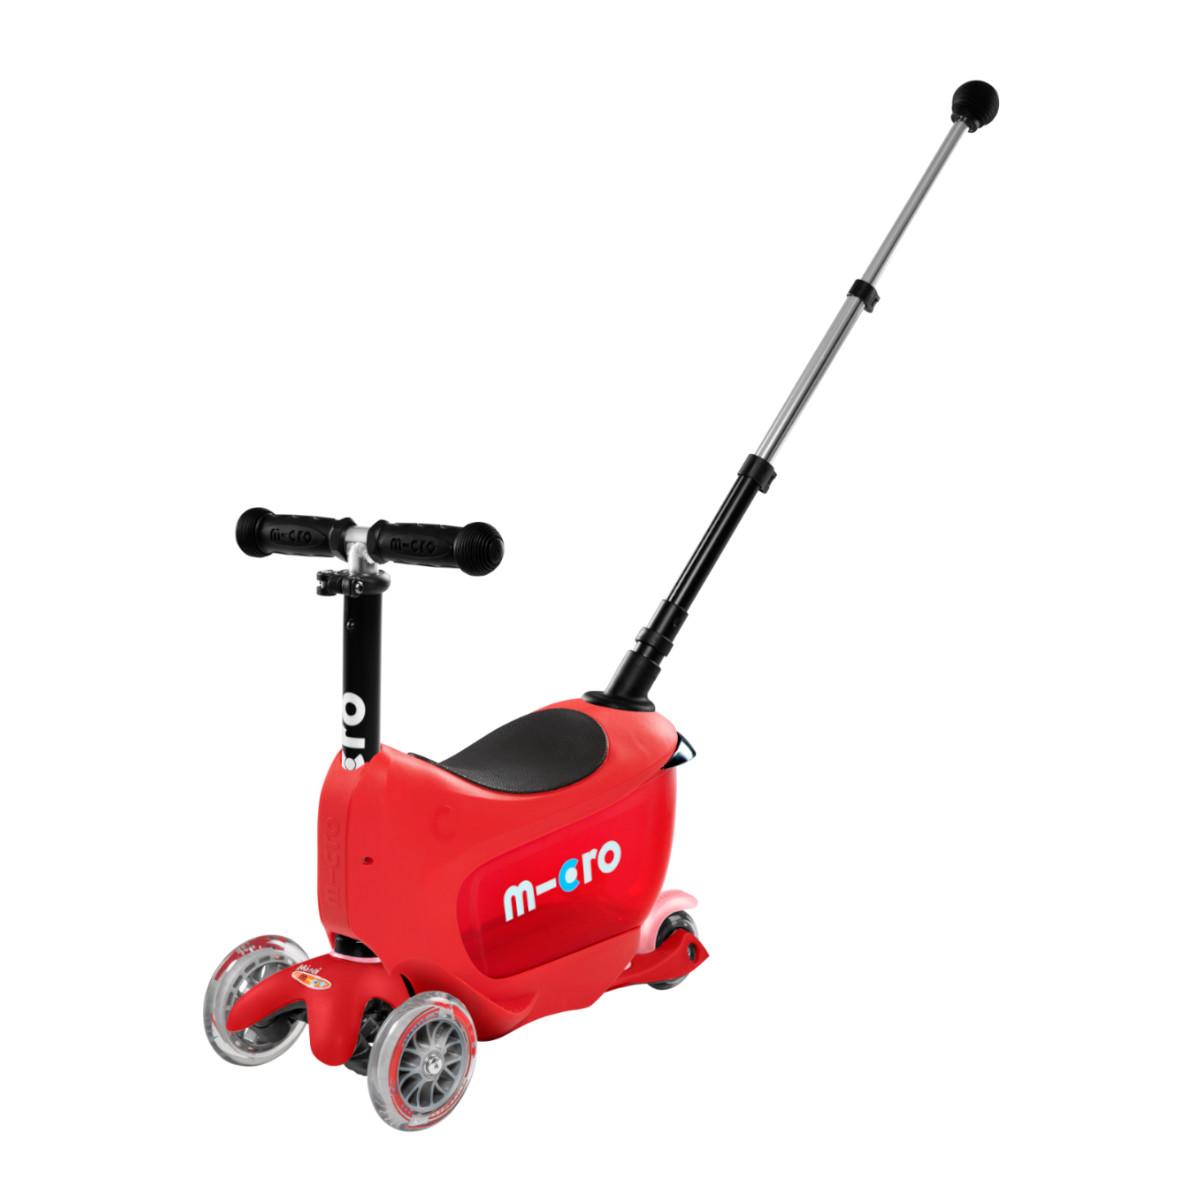 Micro Mini2go Deluxe Plus Red - 04